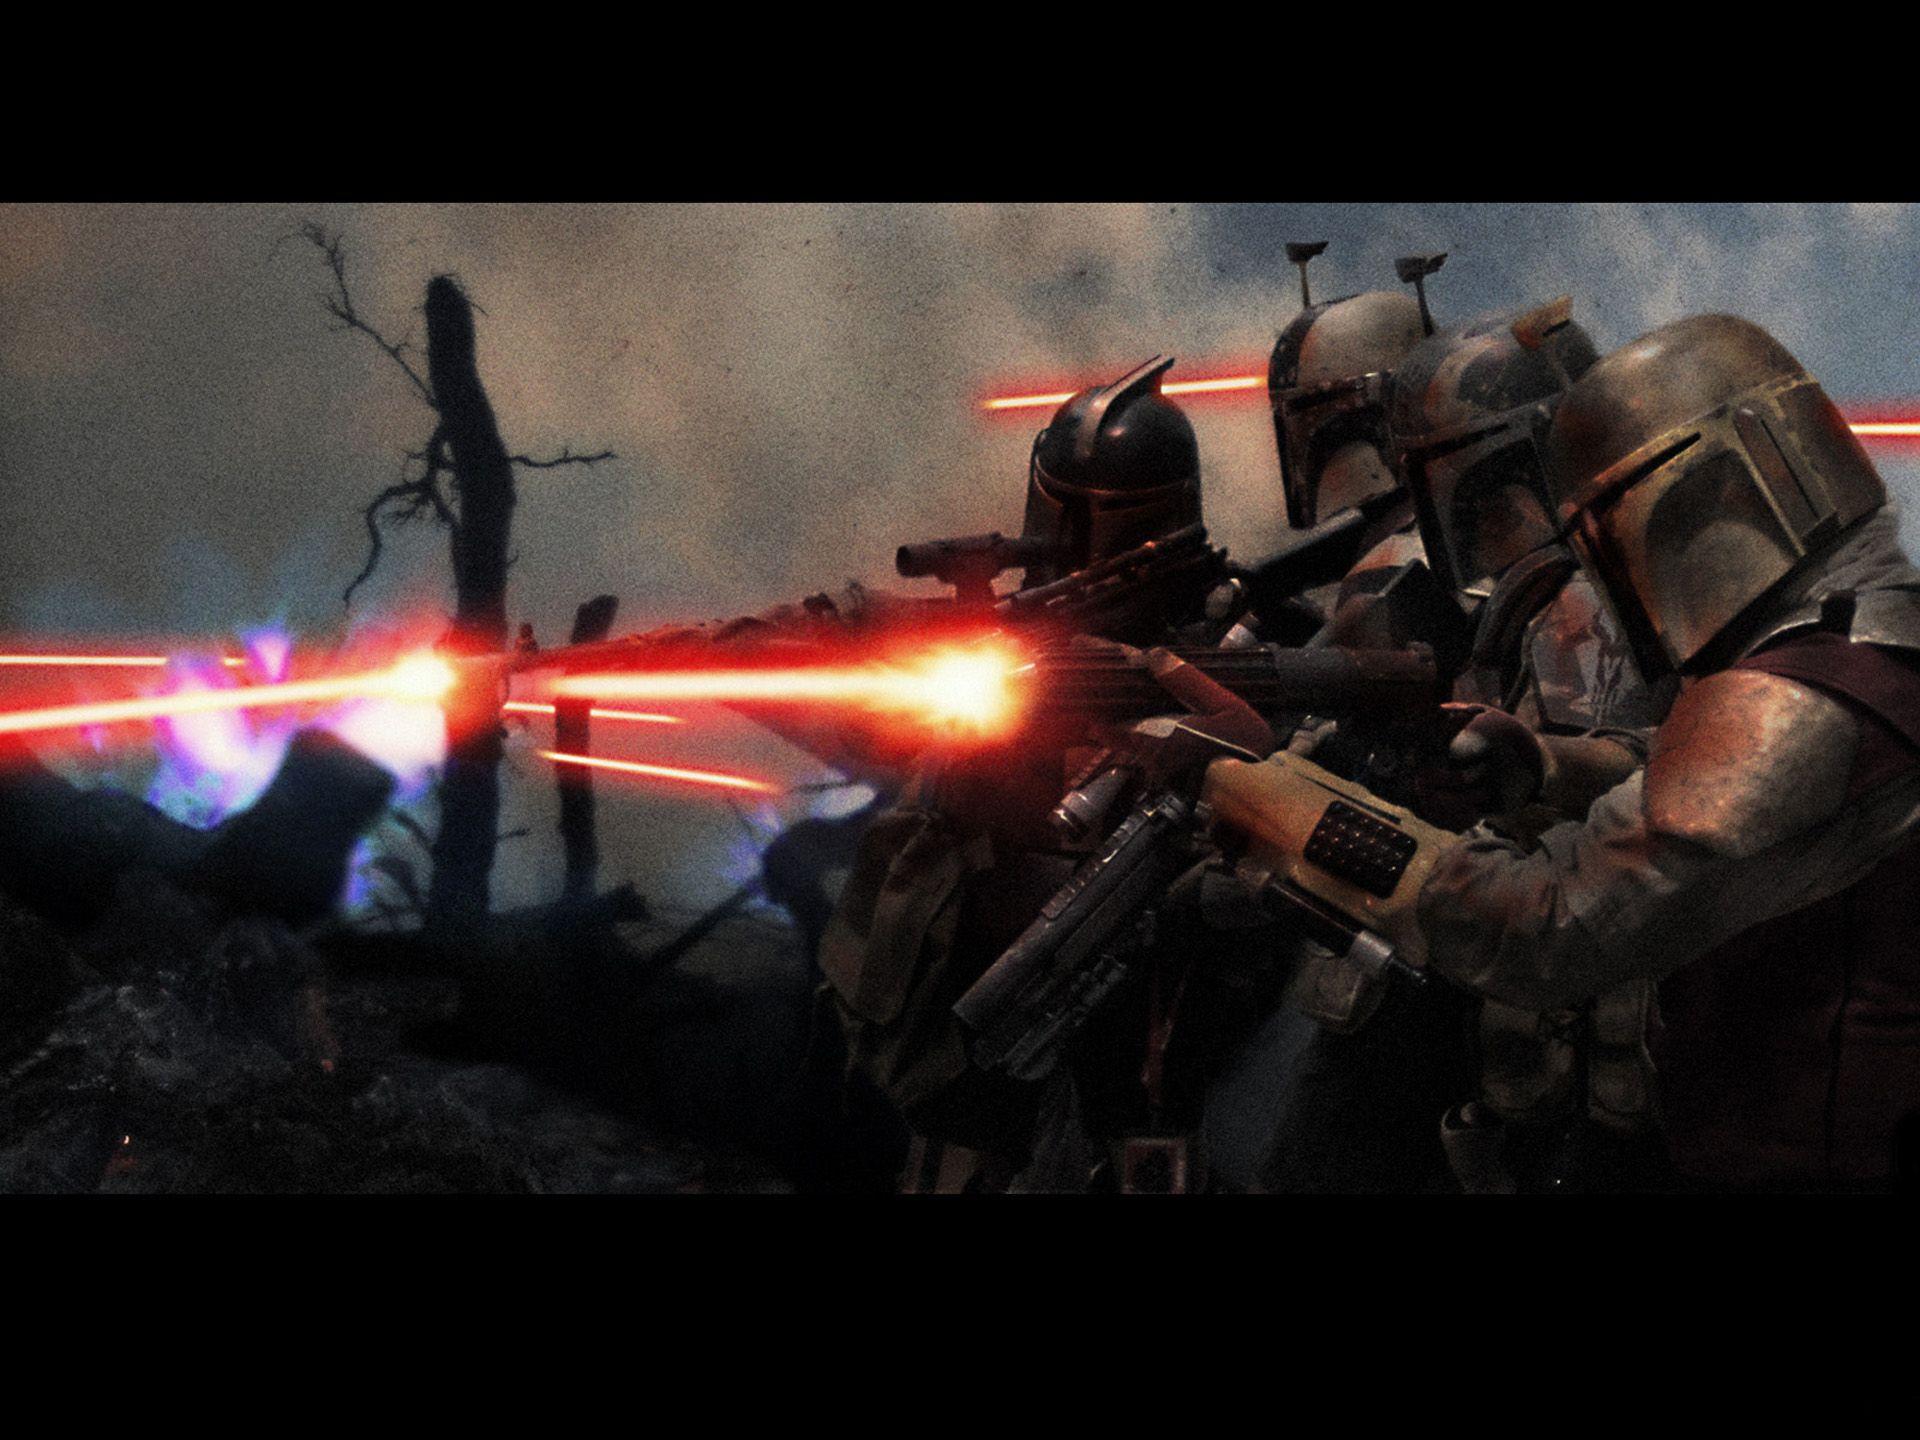 Mandalorians Star Wars Wallpaper Ultimate Star Wars Star Wars Boba Fett